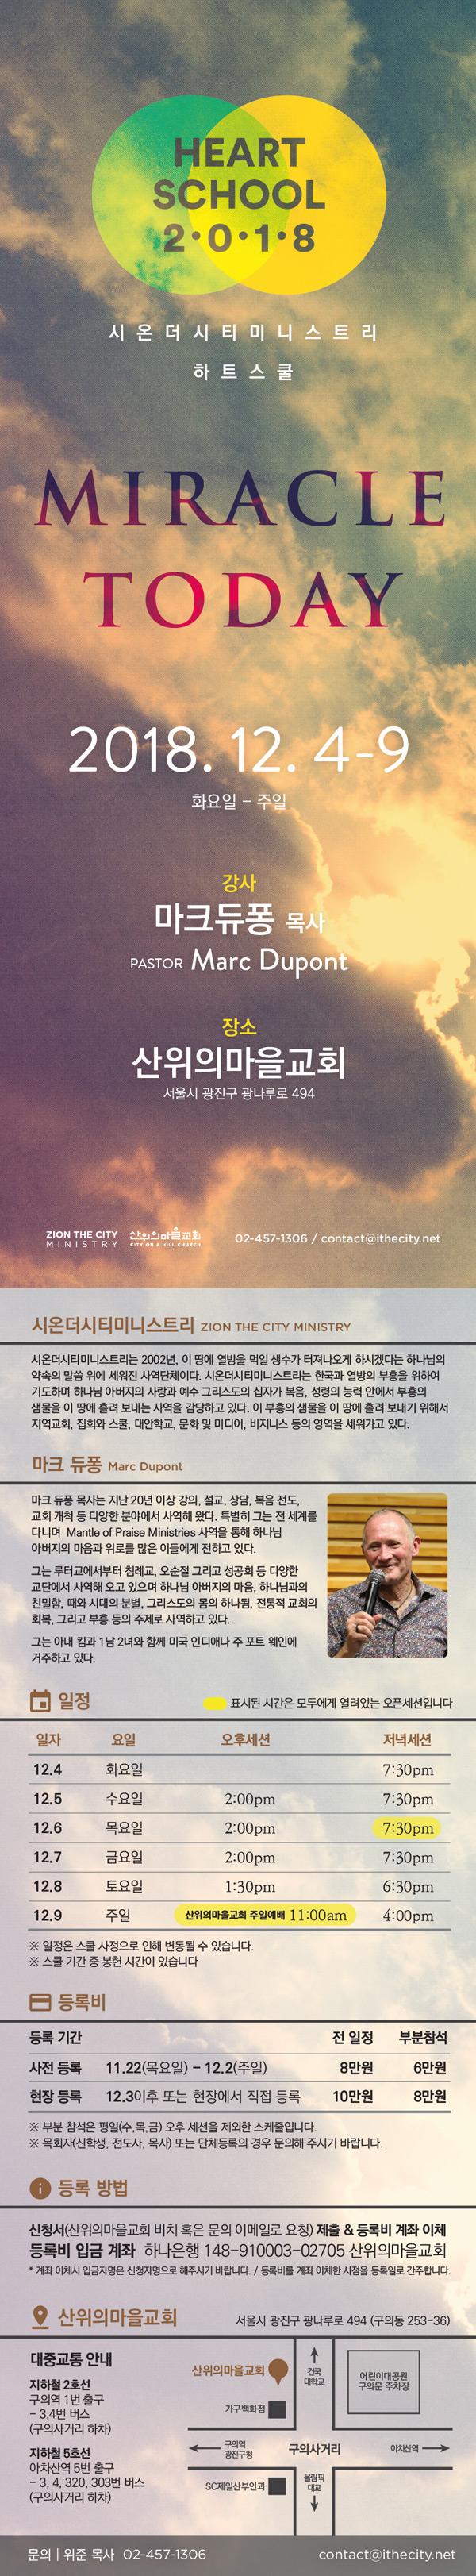 2018HS_marcDupont_brochure_v1_mobile.jpg